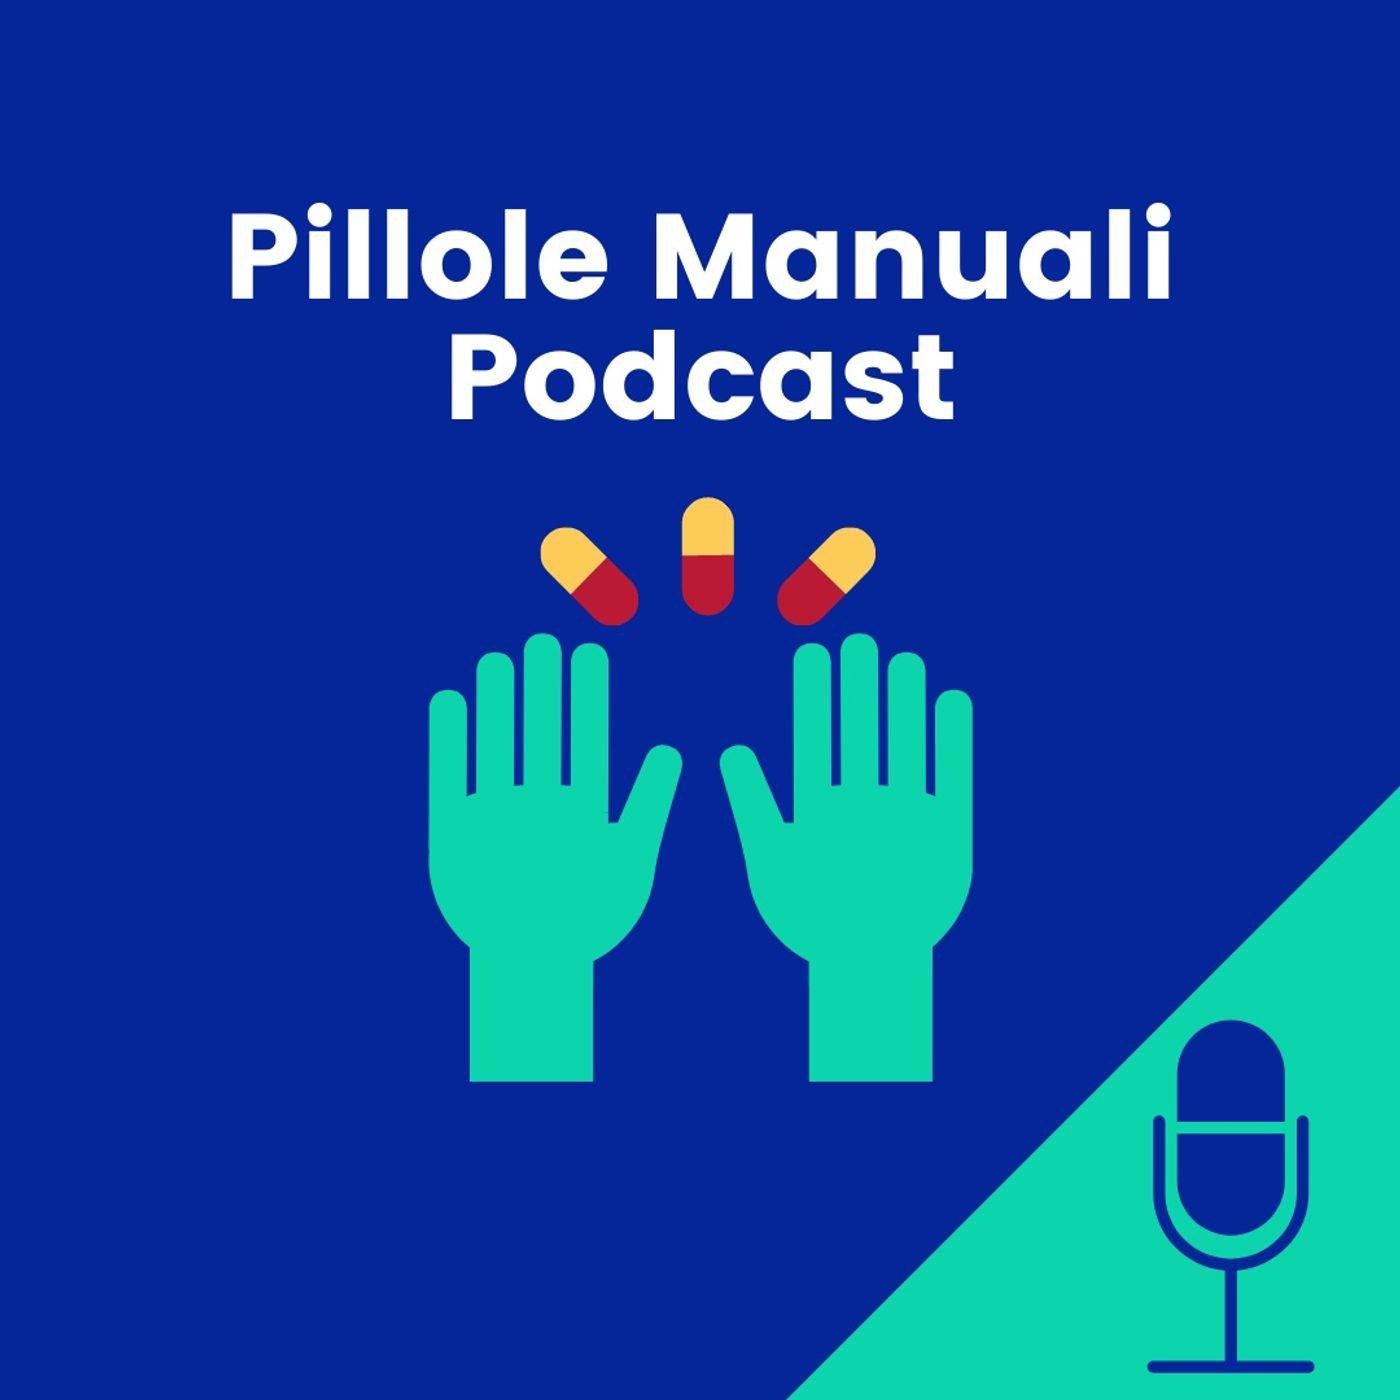 Pillole Manuali Podcast